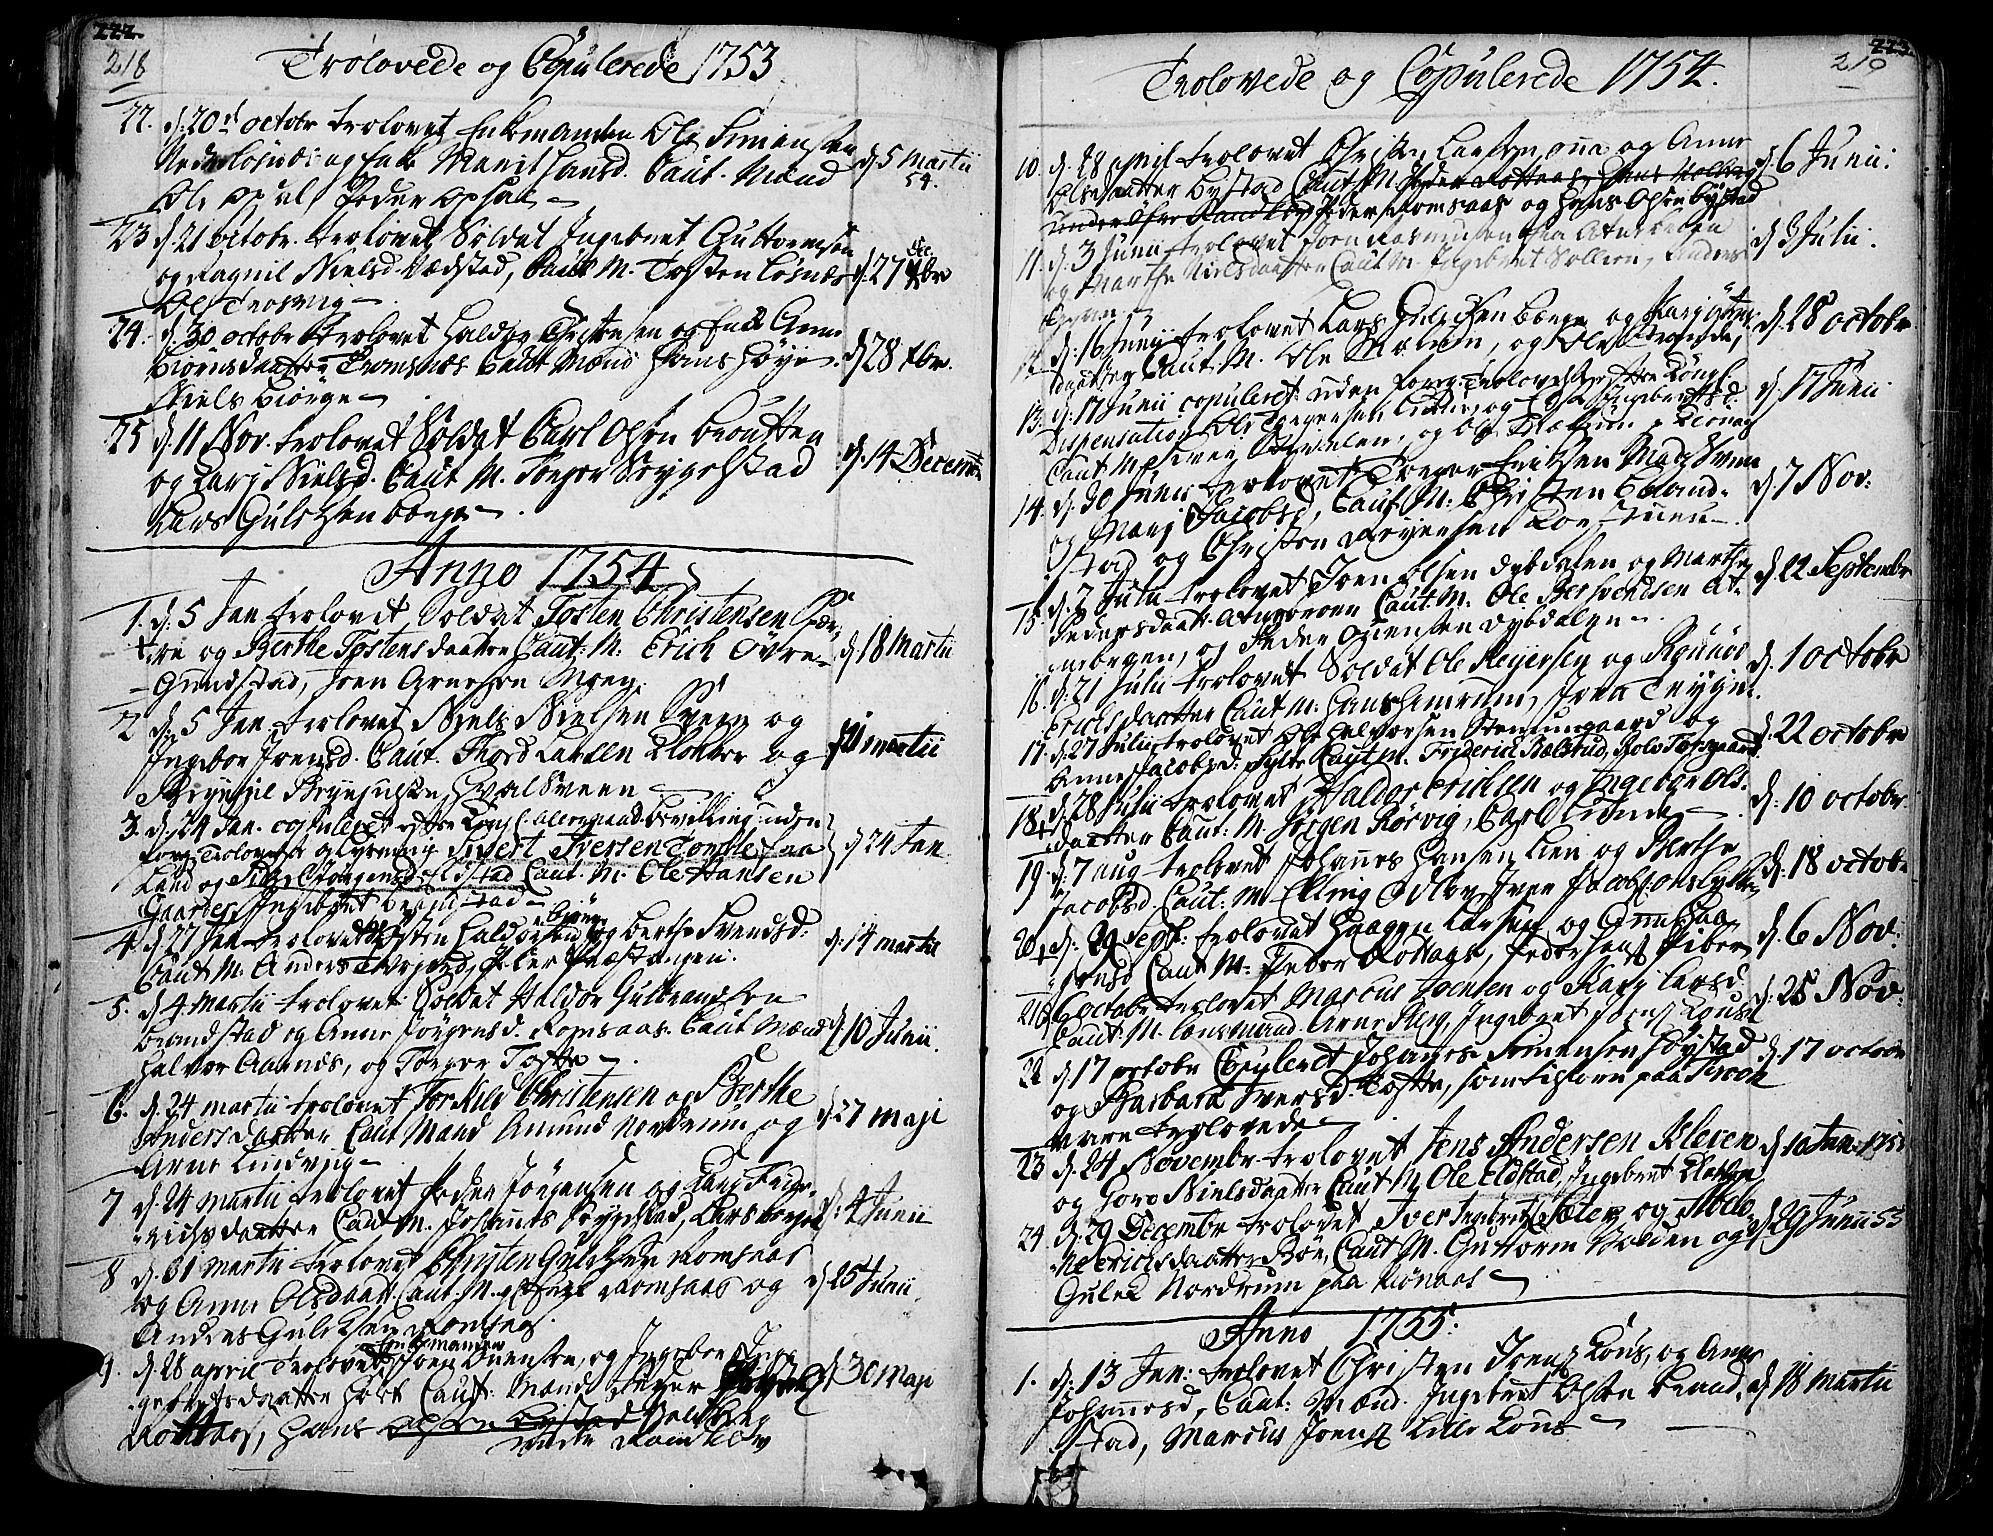 SAH, Ringebu prestekontor, Ministerialbok nr. 2, 1734-1780, s. 218-219